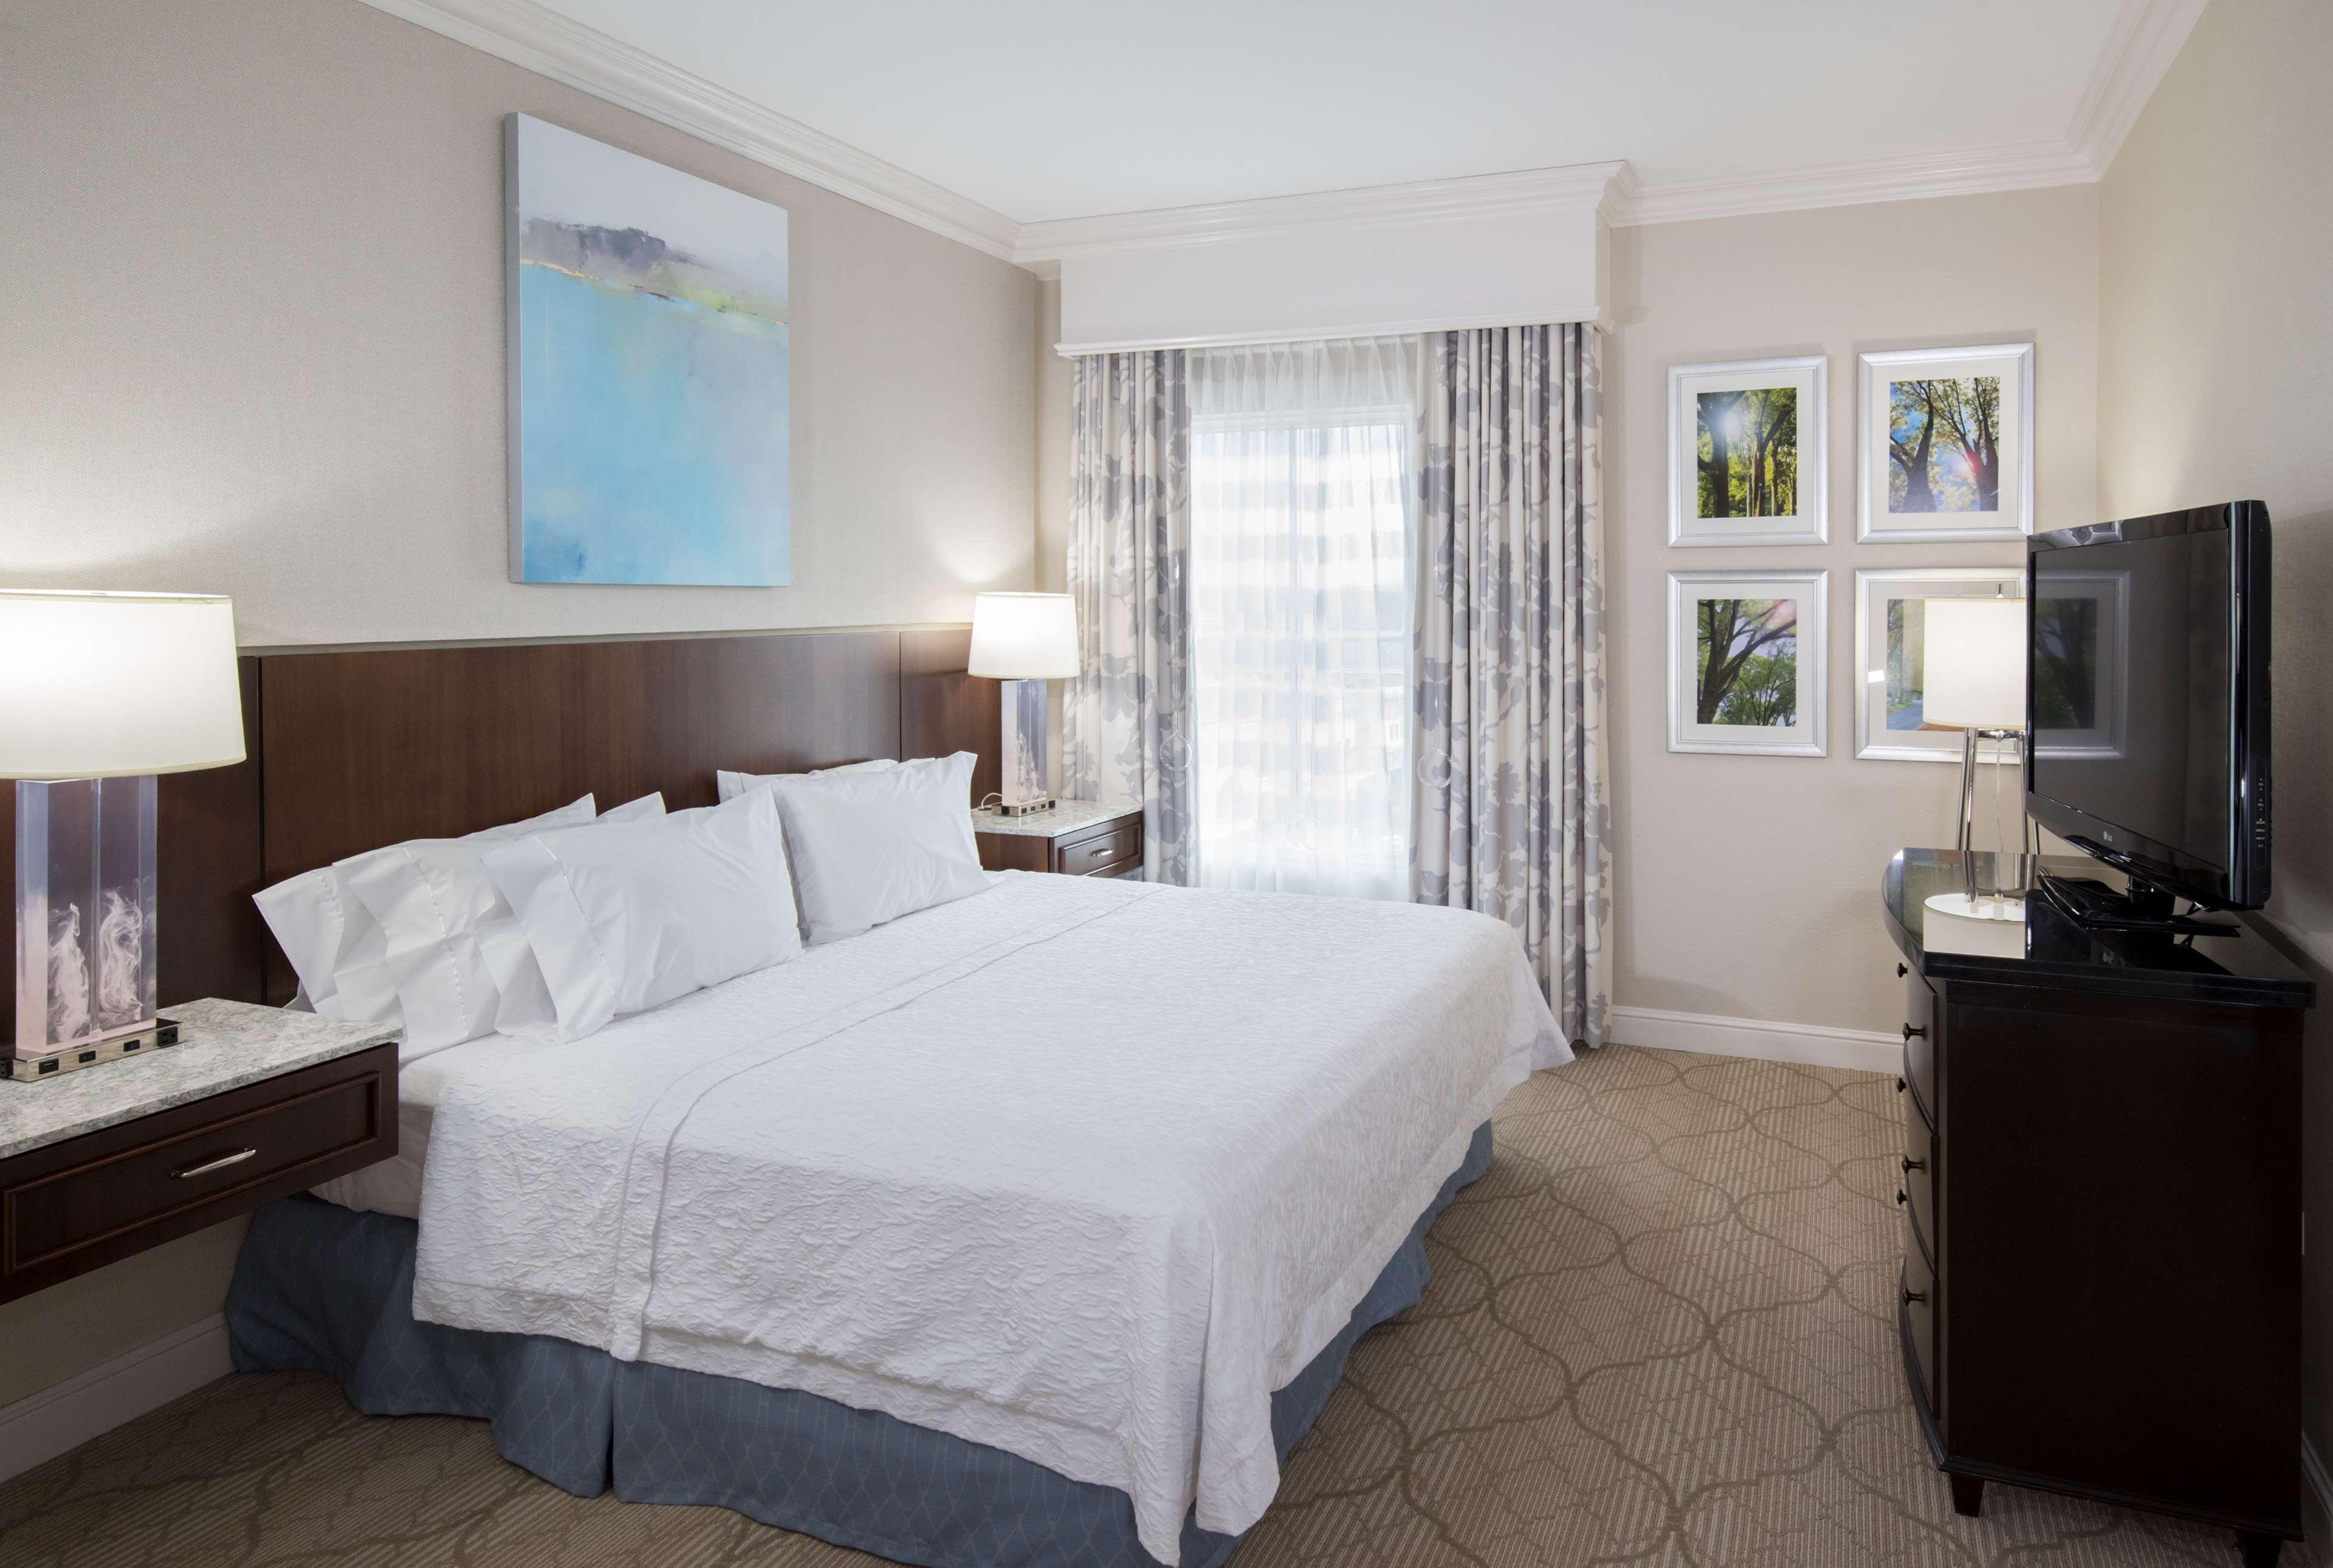 Hampton Inn & Suites Charlotte/South Park at Phillips Place image 19